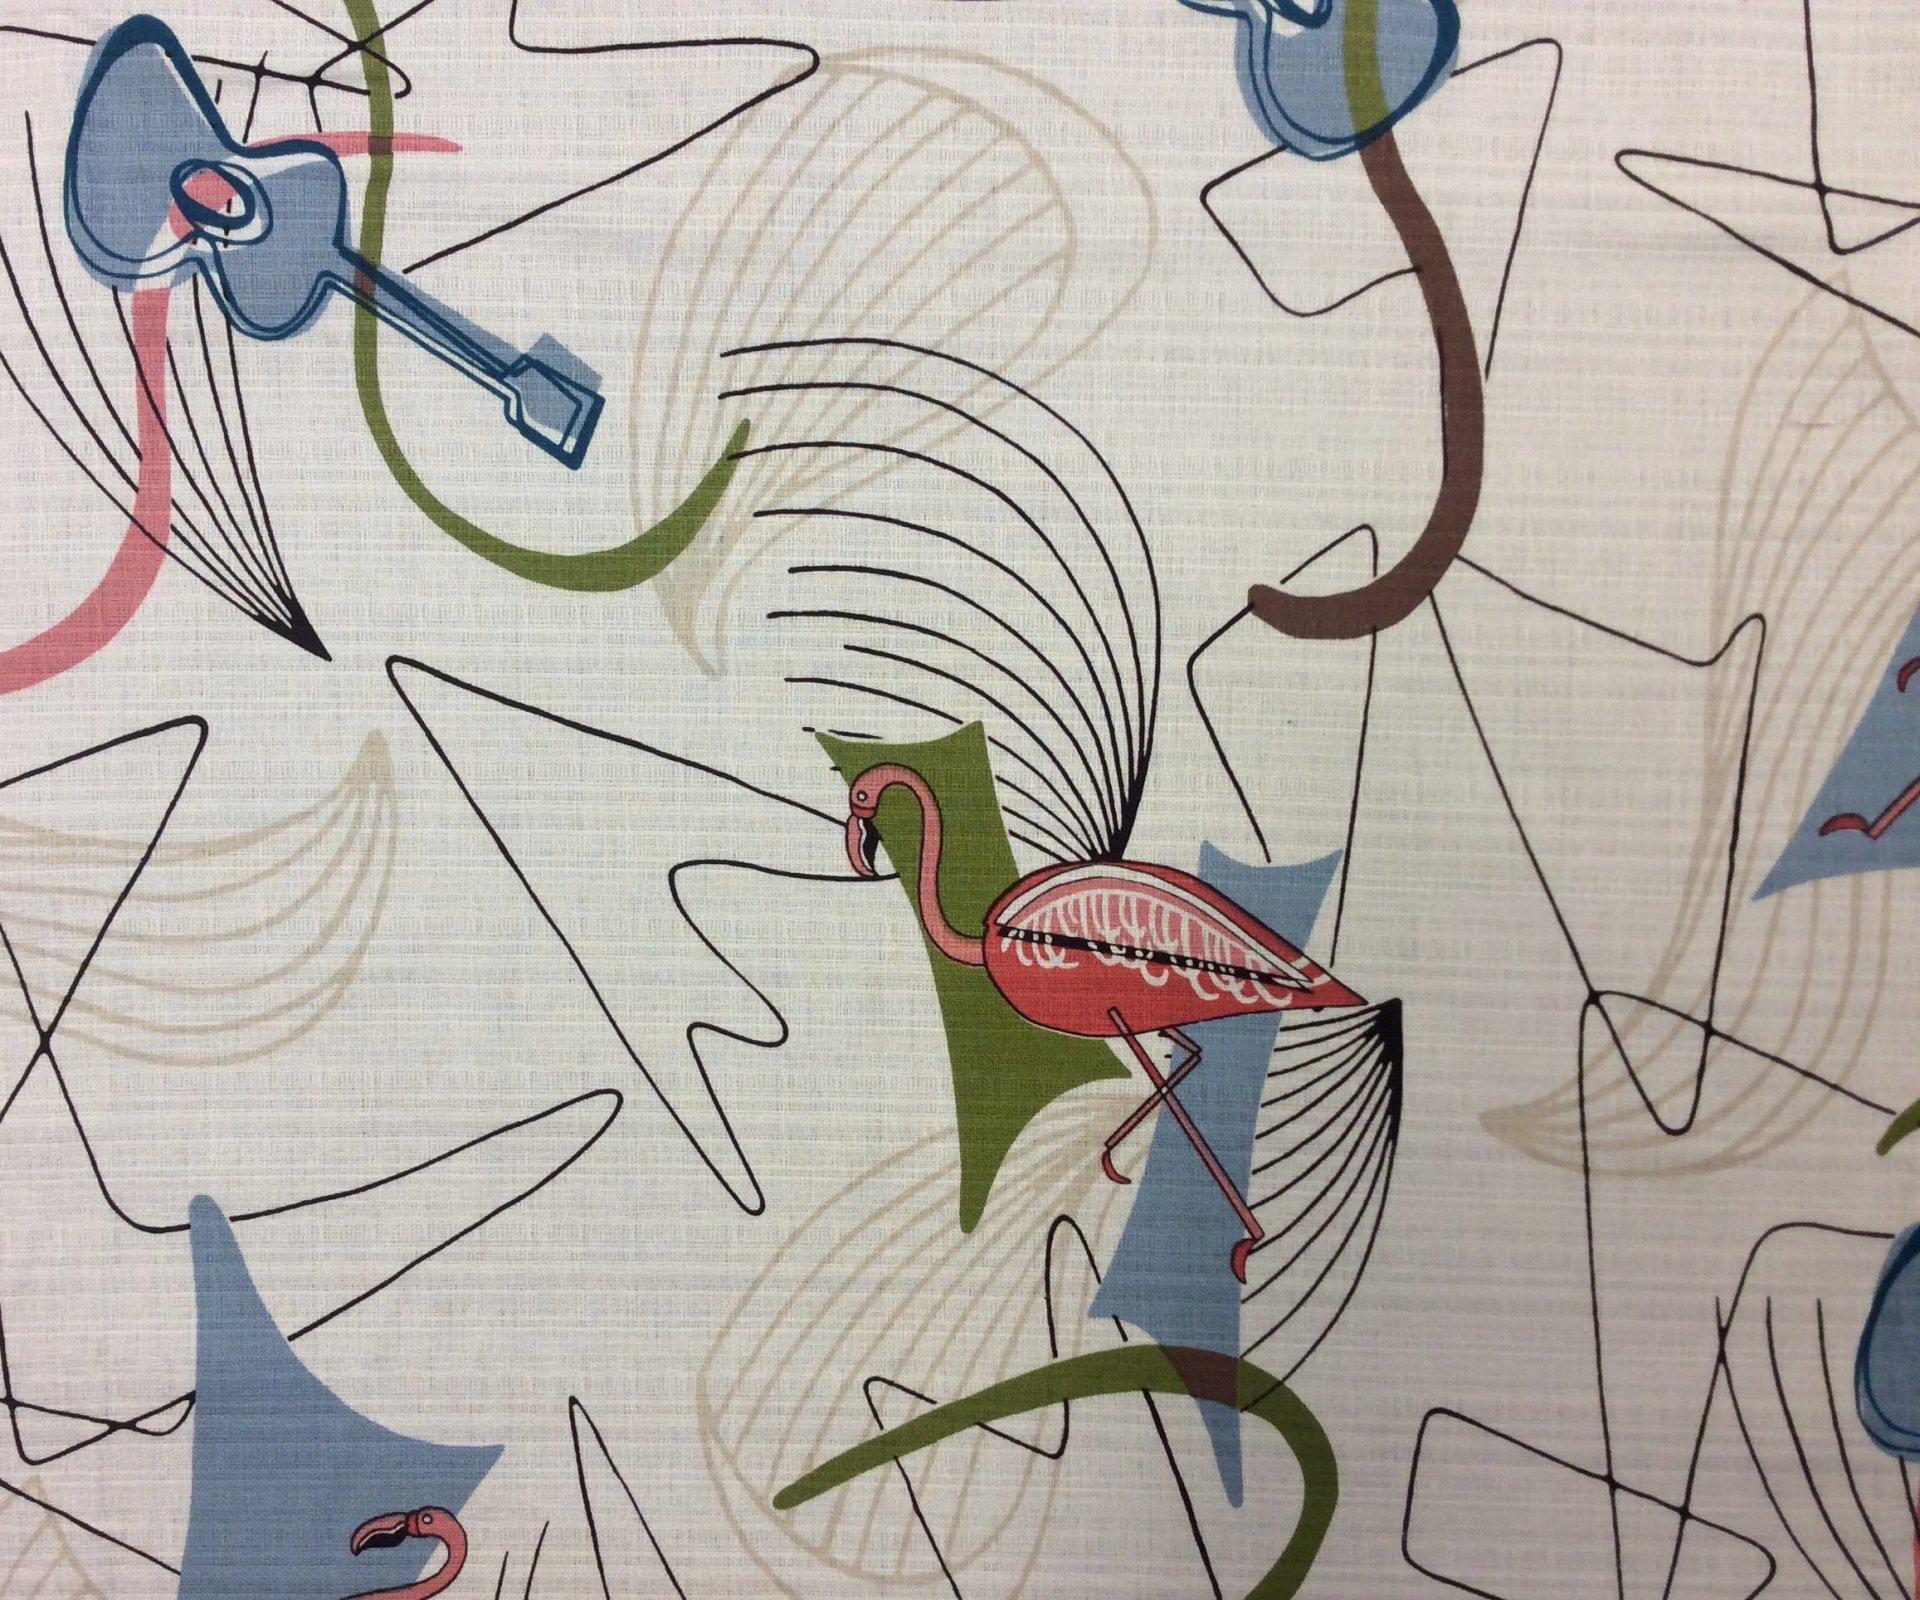 Atomic Retro Barkcloth Flamingo Boomerang Sputnik MCM Mid Century Modern Slubby Texture Home Dec Cotton Fabric HM21